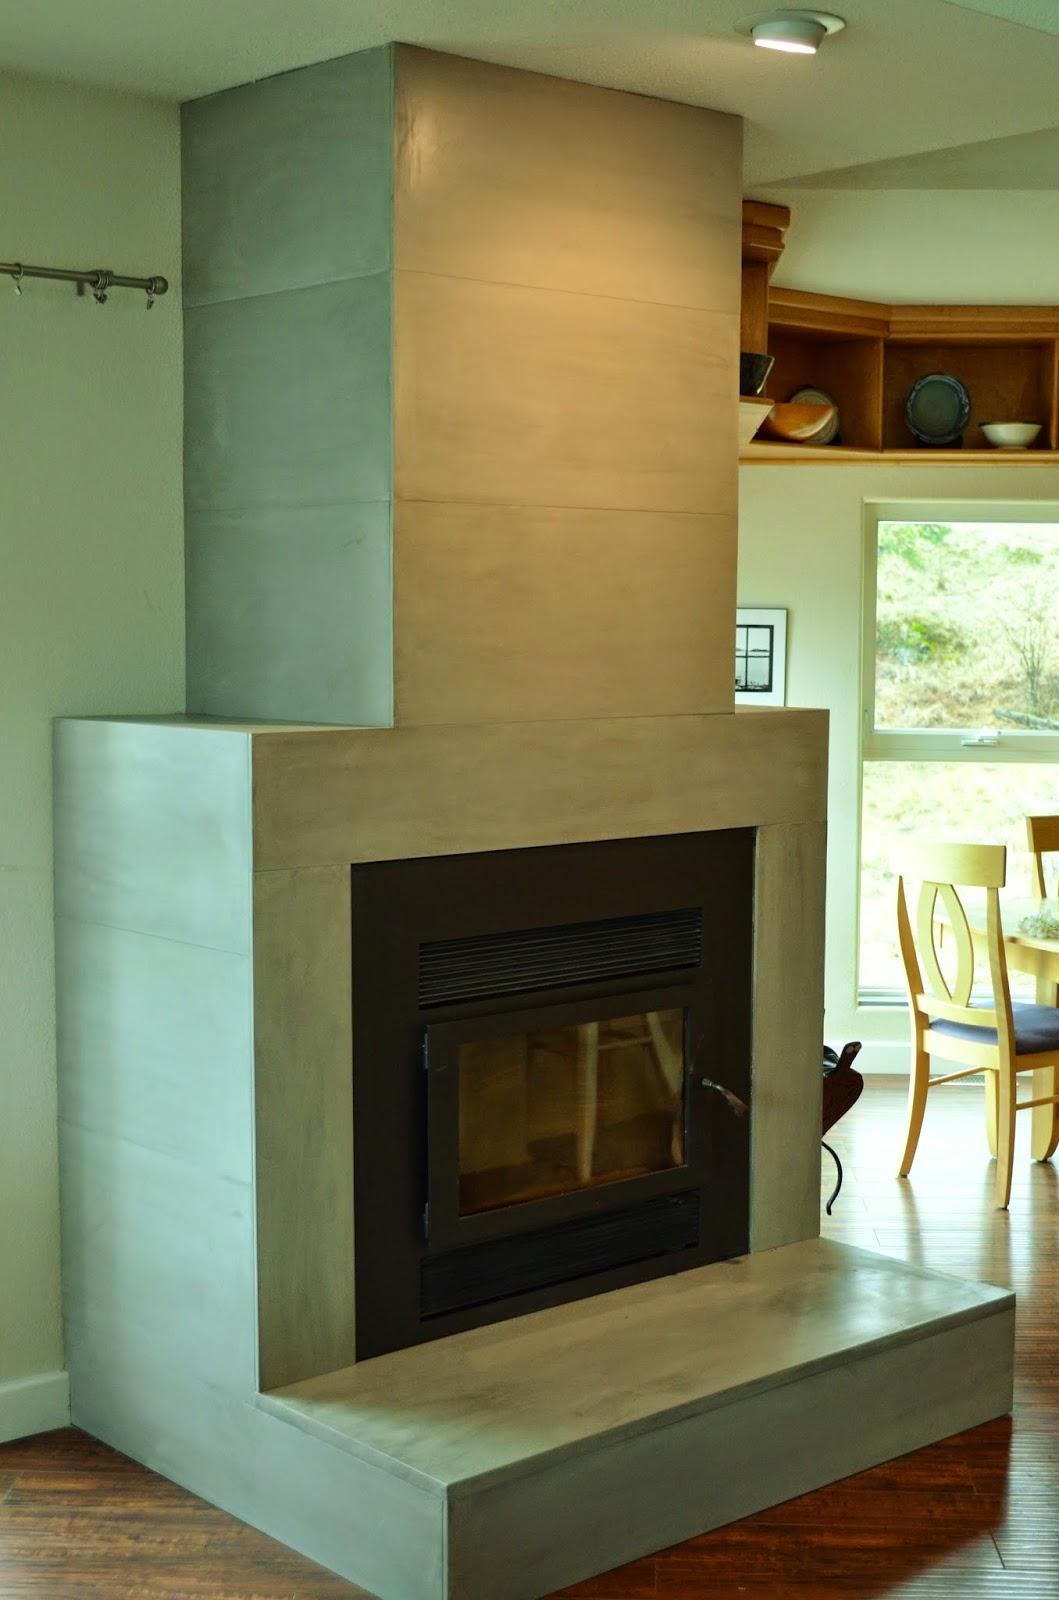 MODE CONCRETE: Contemporary Tiled Concrete Fireplace ...